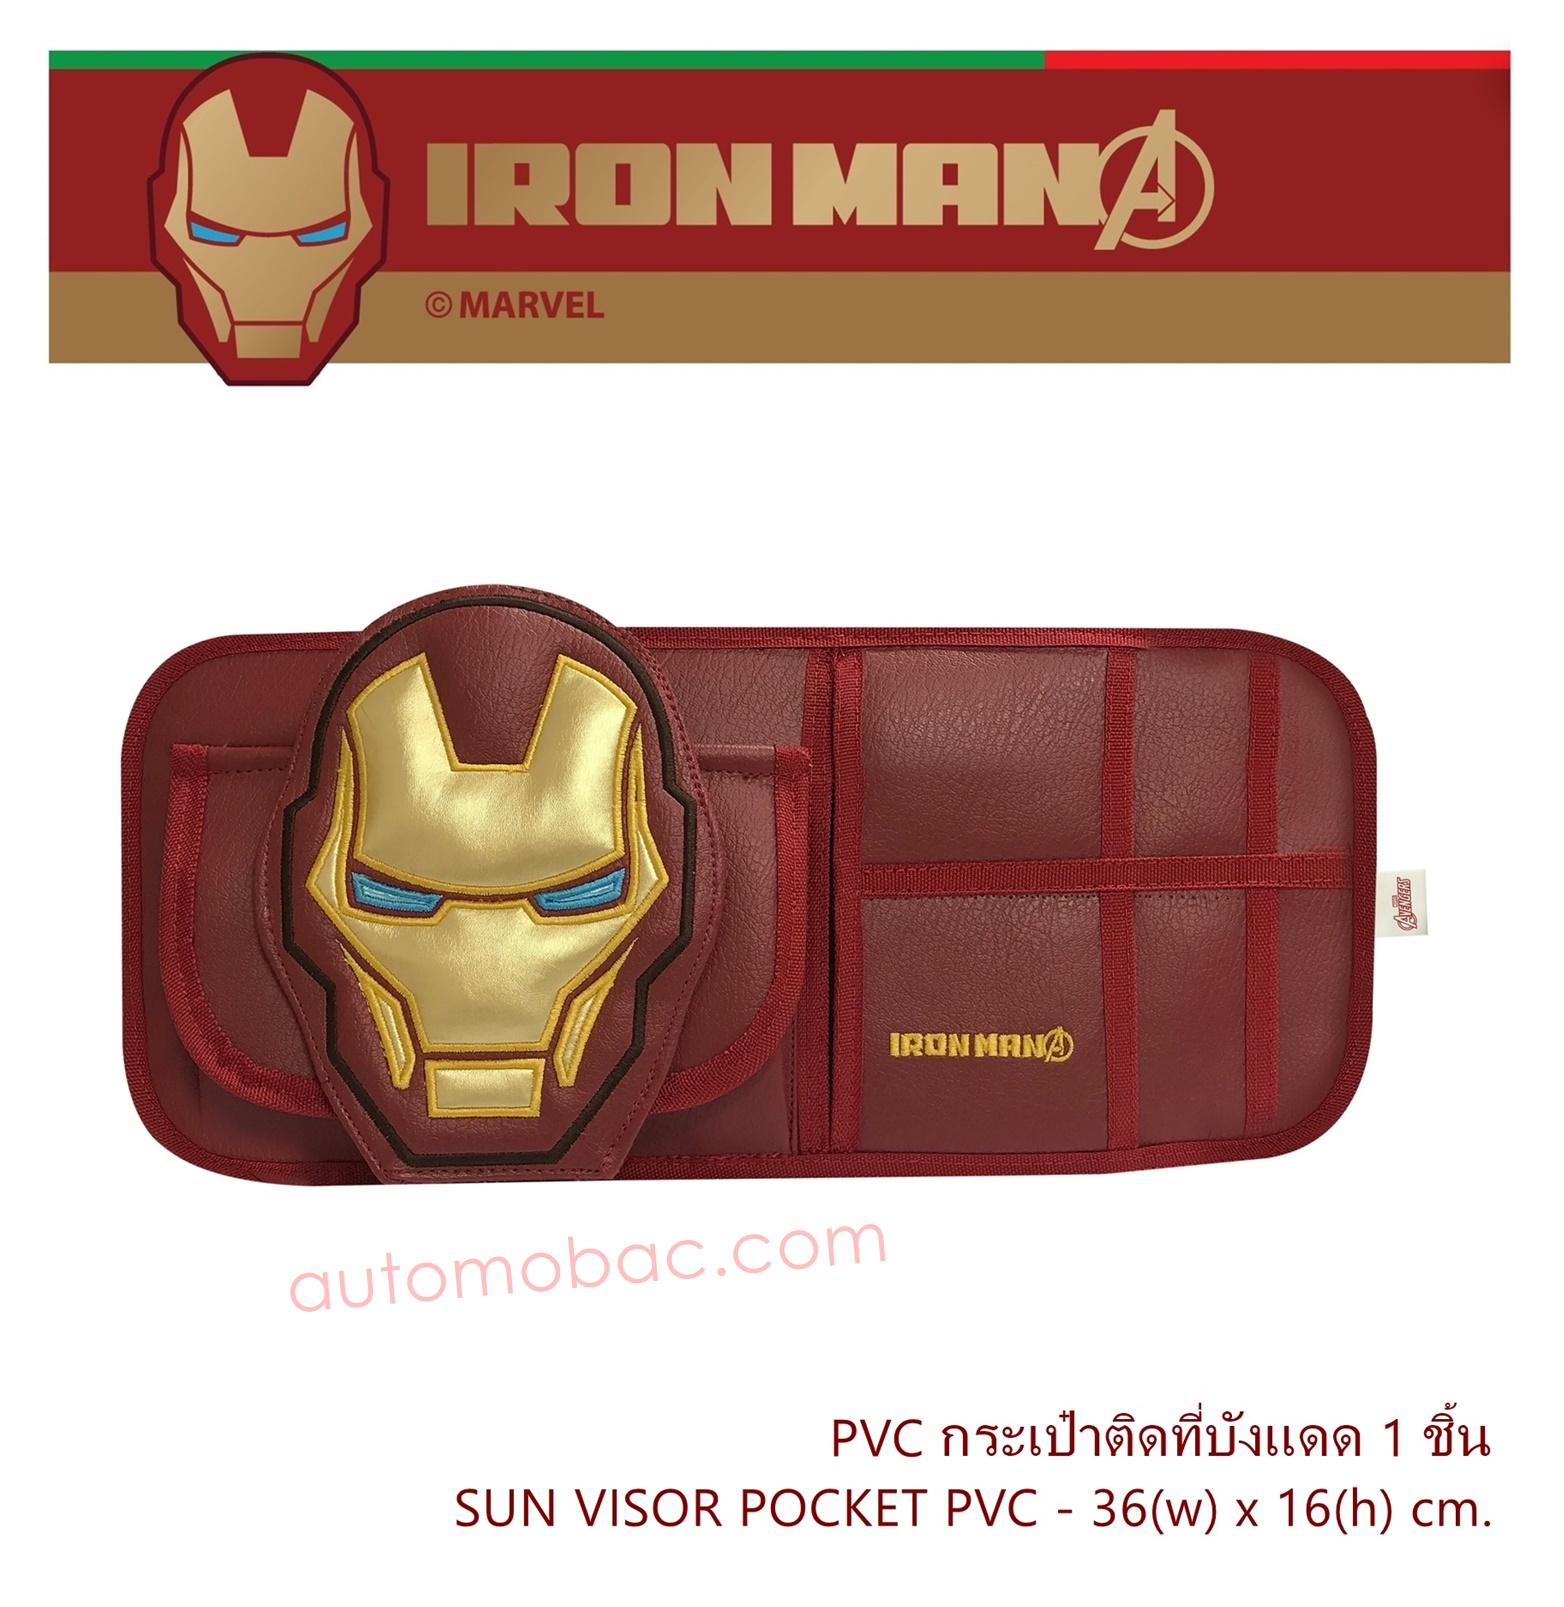 IRON-MAN กระเป๋าติดที่บังแดด 1 ชิ้น หนัง PVC มีที่ใส่แว่นตา และนามบัตร จัดระเบียบ หยิบใช้สะดวก  ทำ